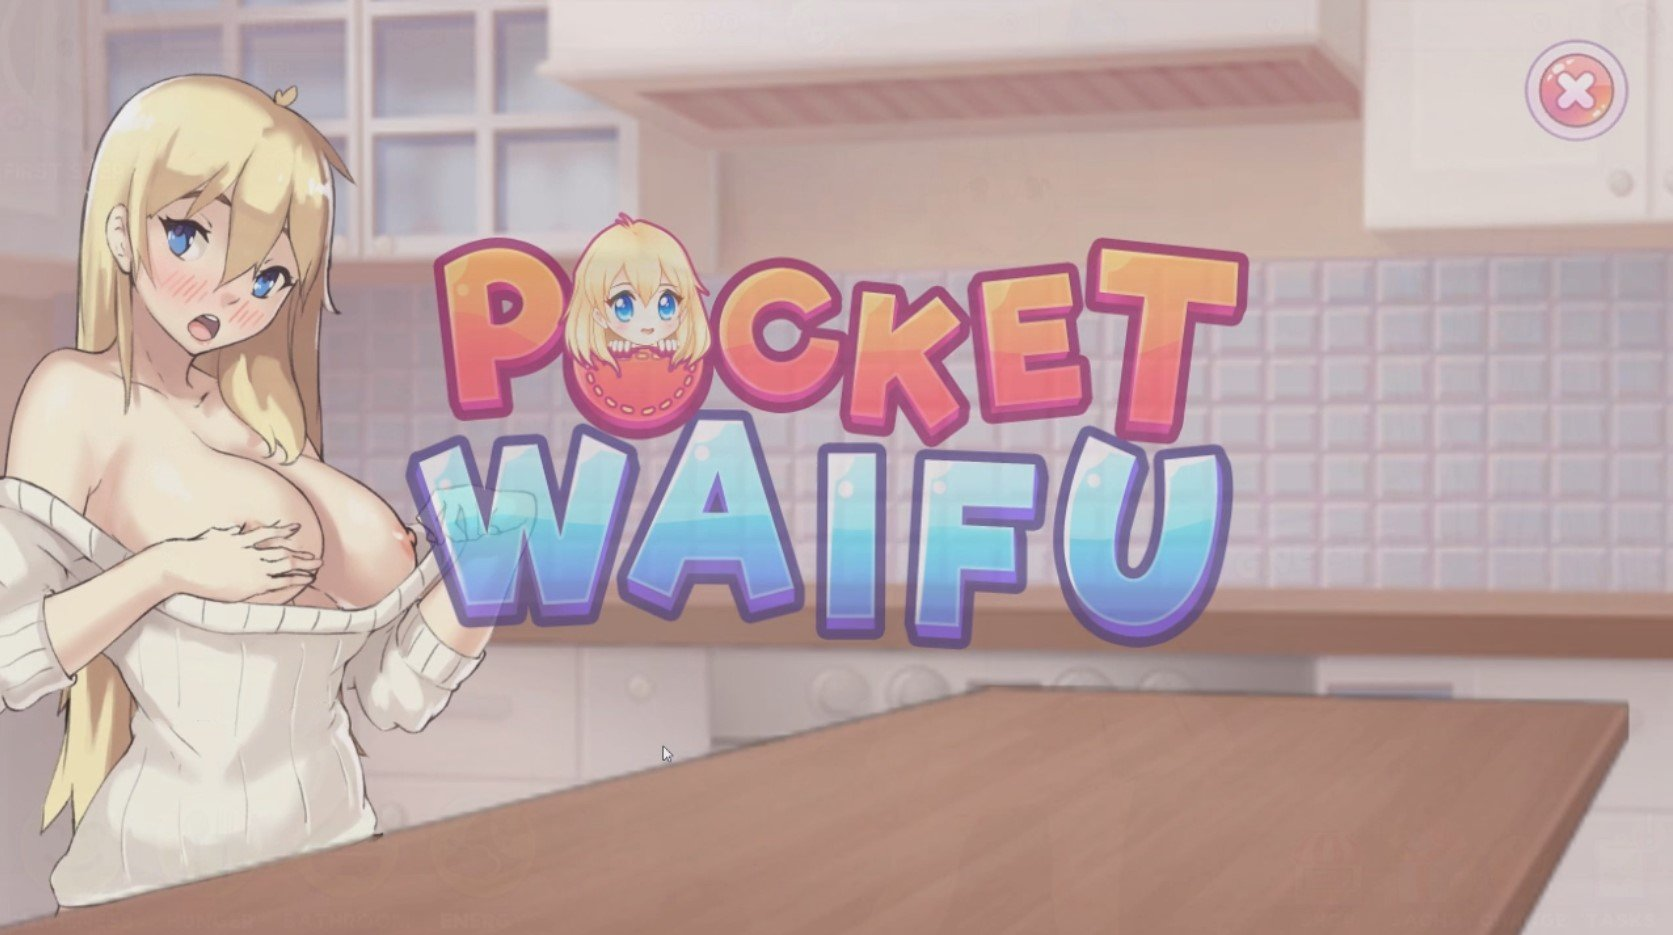 strategy Game - Pocket Waifu